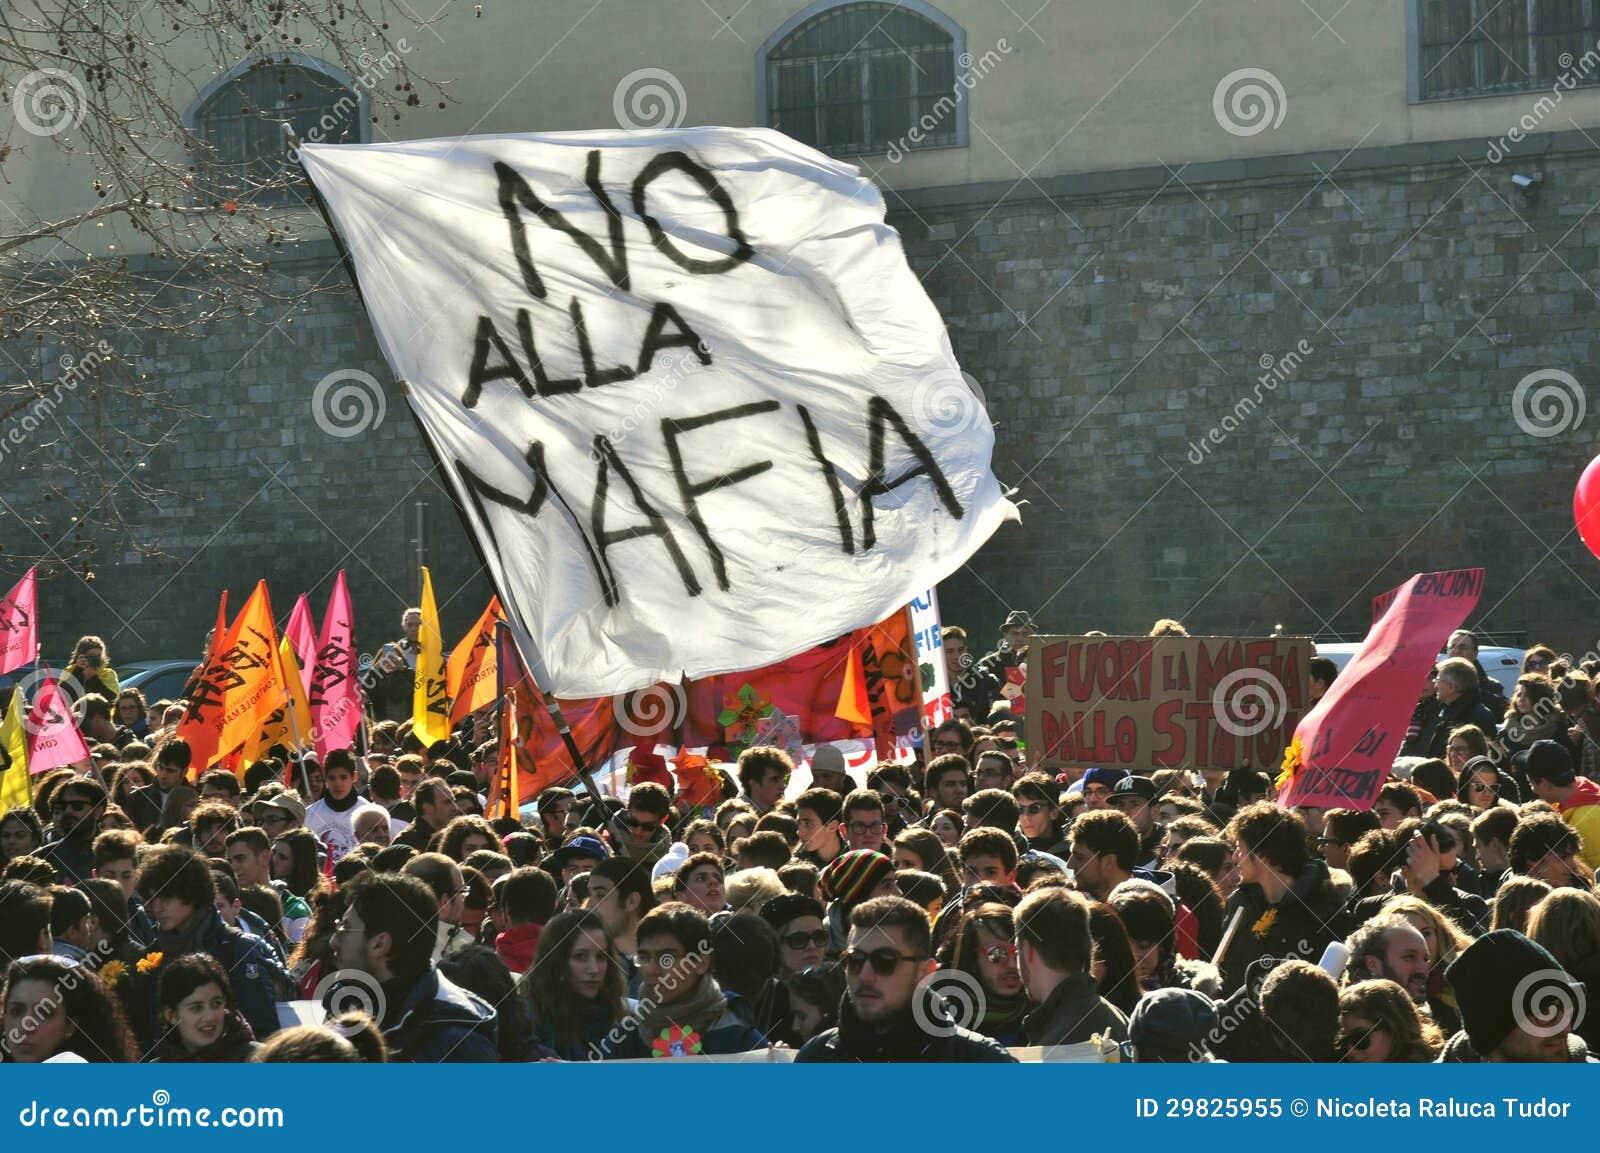 Demonstratie tegen Maffia, menigte, in Italië